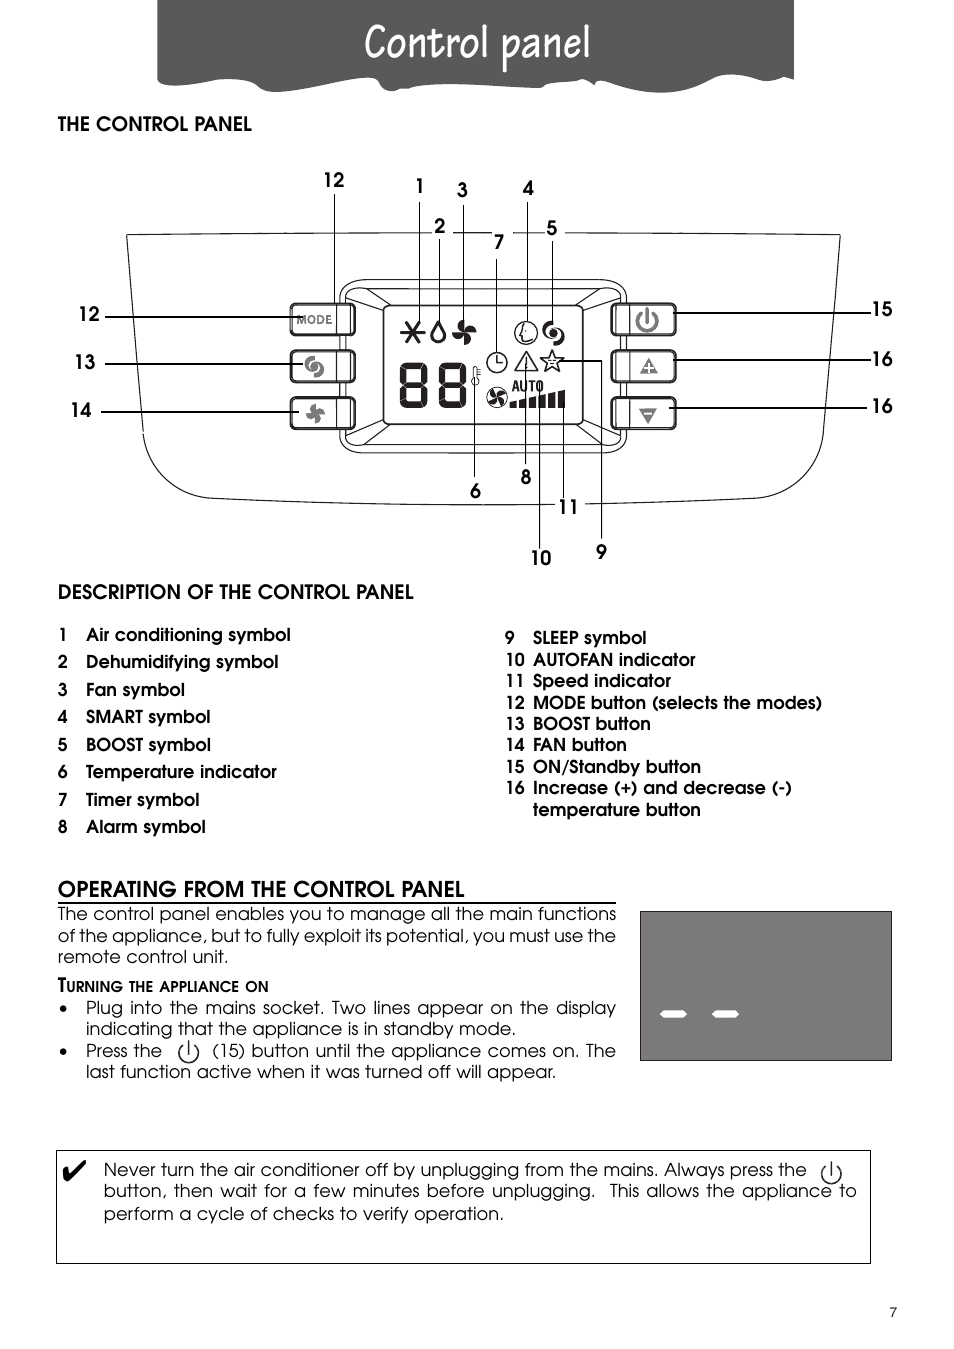 Control panel delonghi paca110 a120e user manual page 7 18 control panel delonghi paca110 a120e user manual page 7 18 biocorpaavc